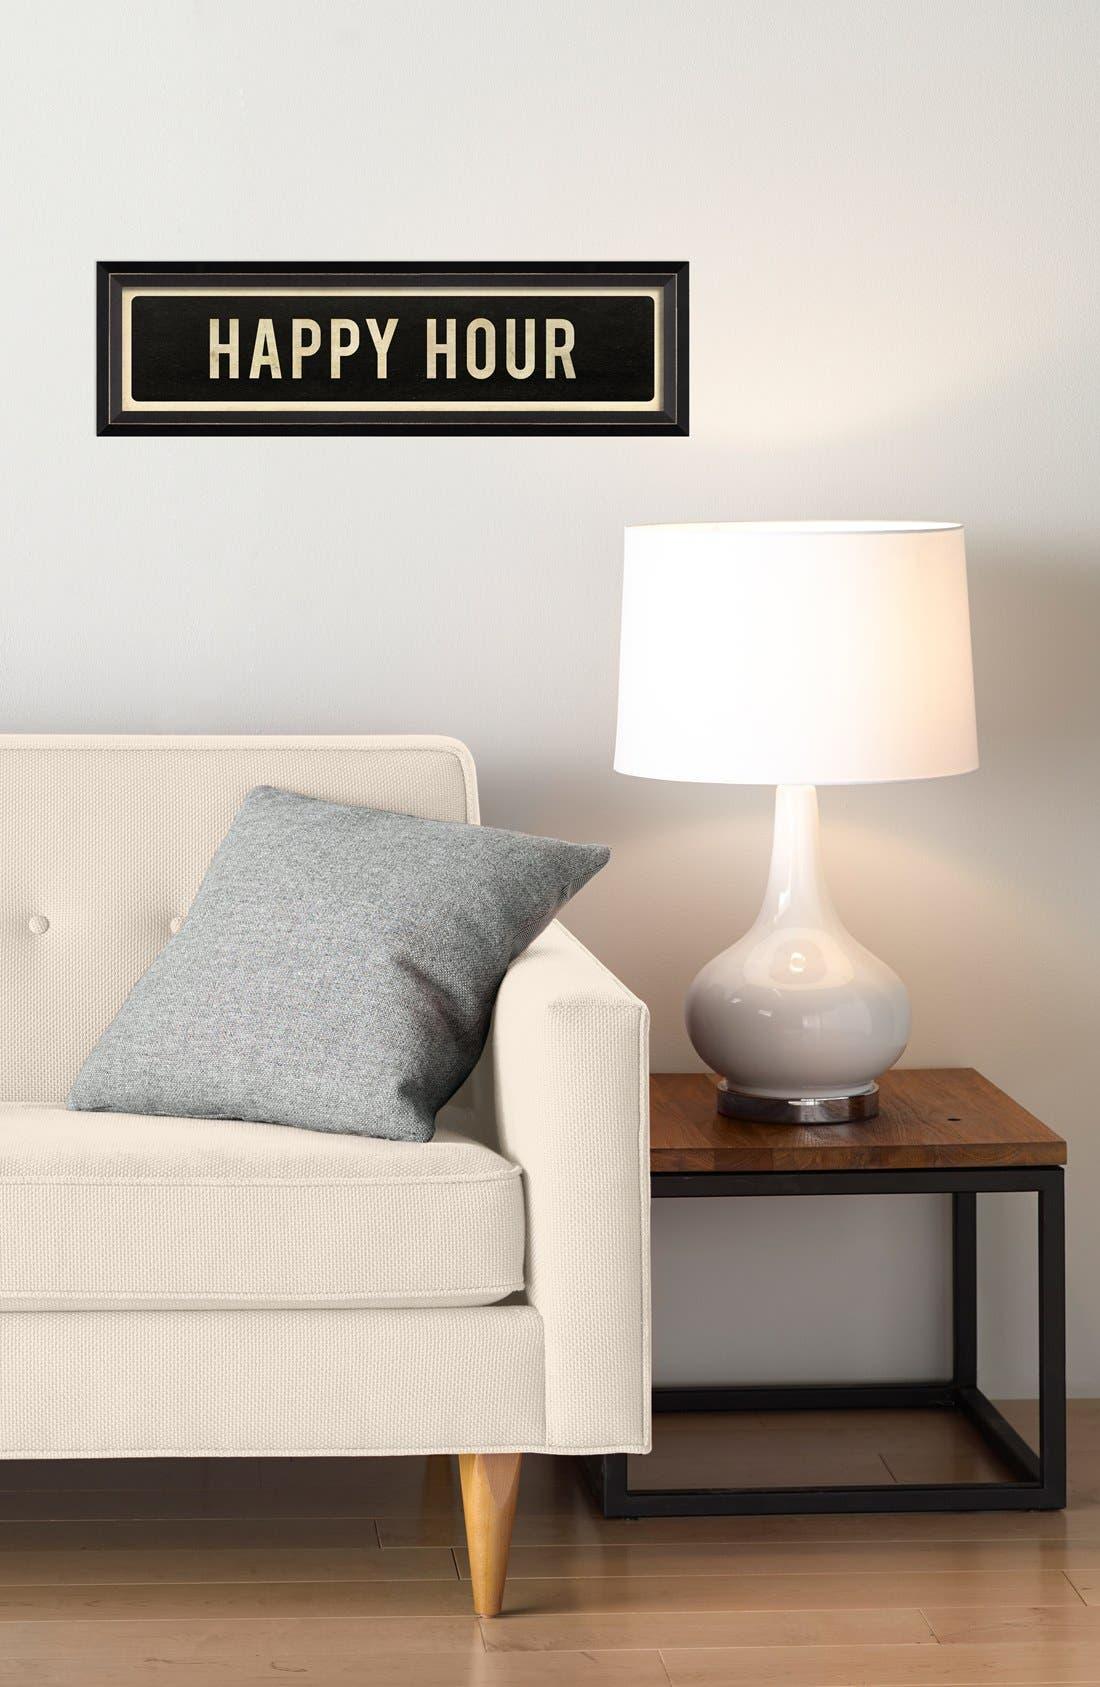 'Happy Hour' Vintage Look Street Sign Artwork,                             Alternate thumbnail 2, color,                             001